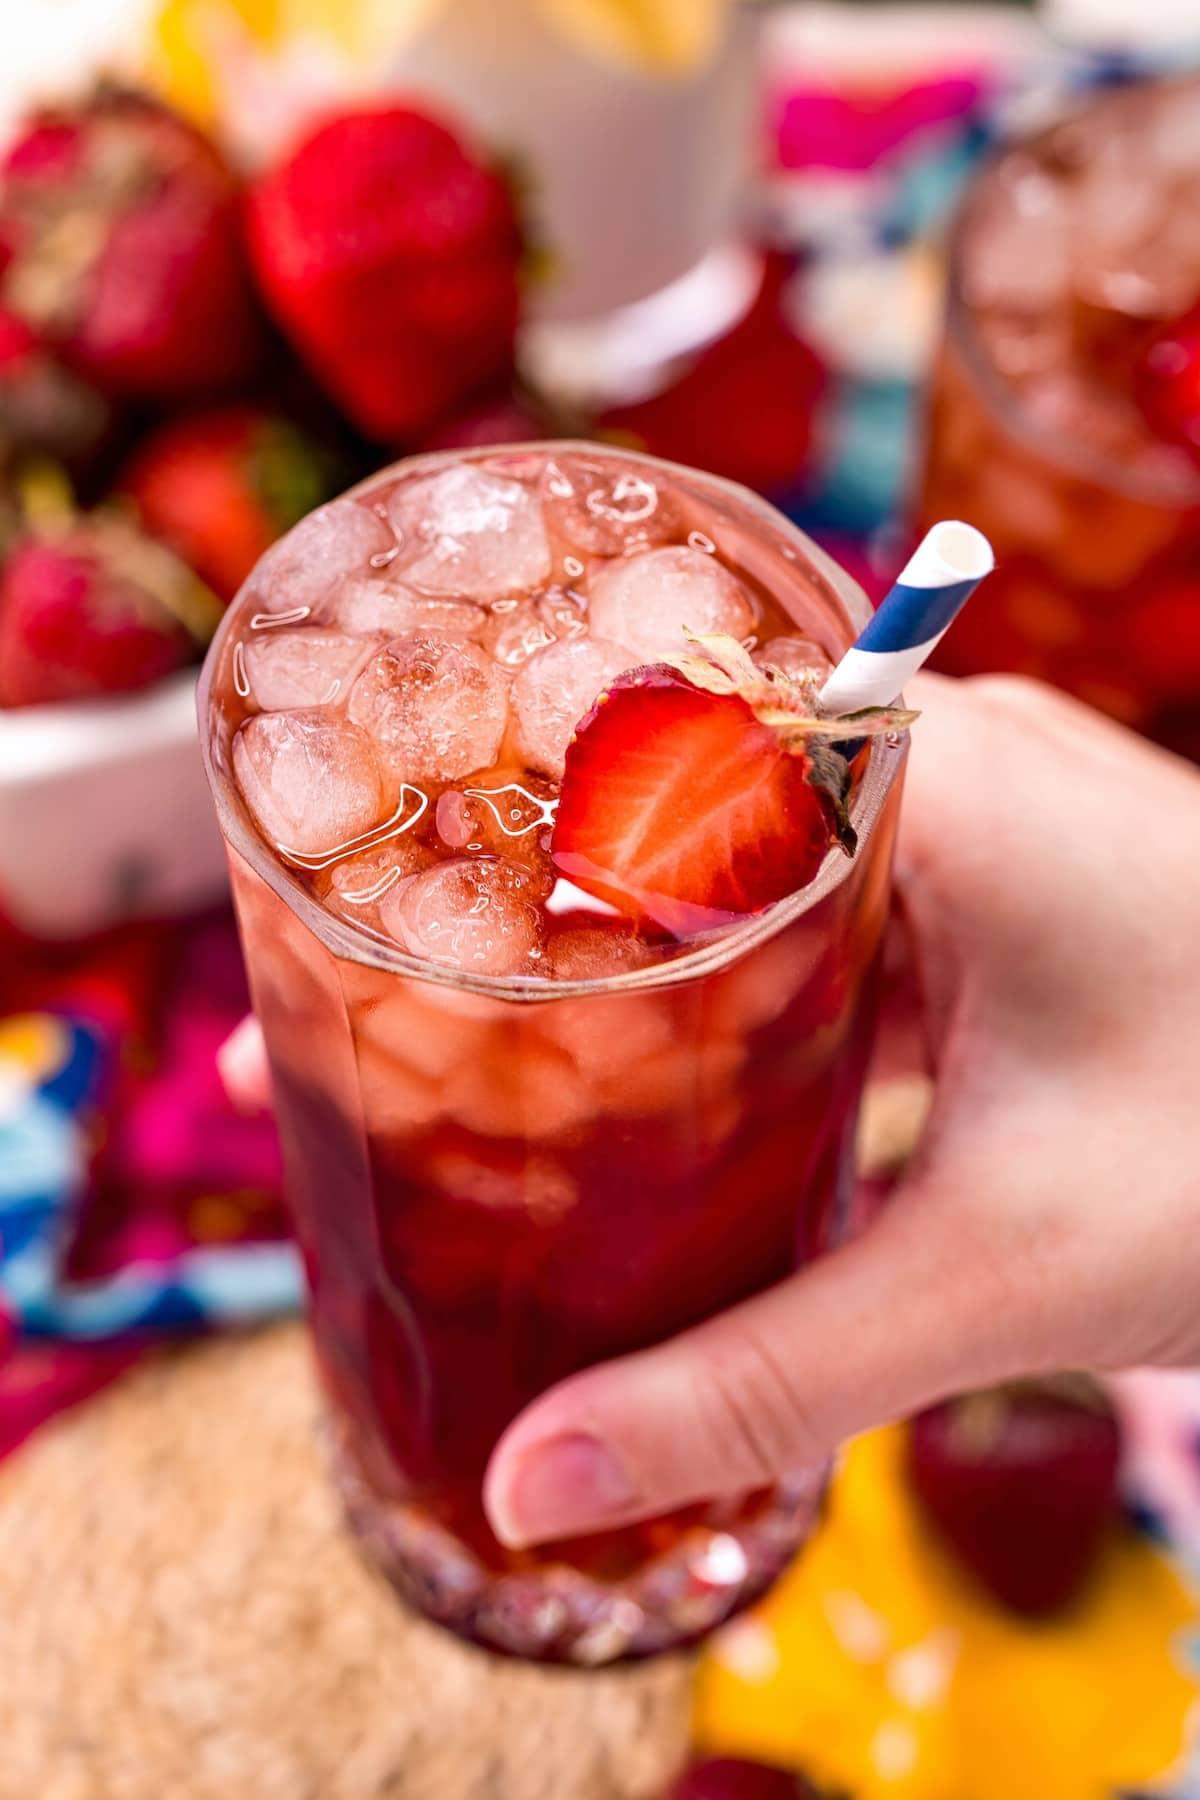 strawberry sweet tea held by hand